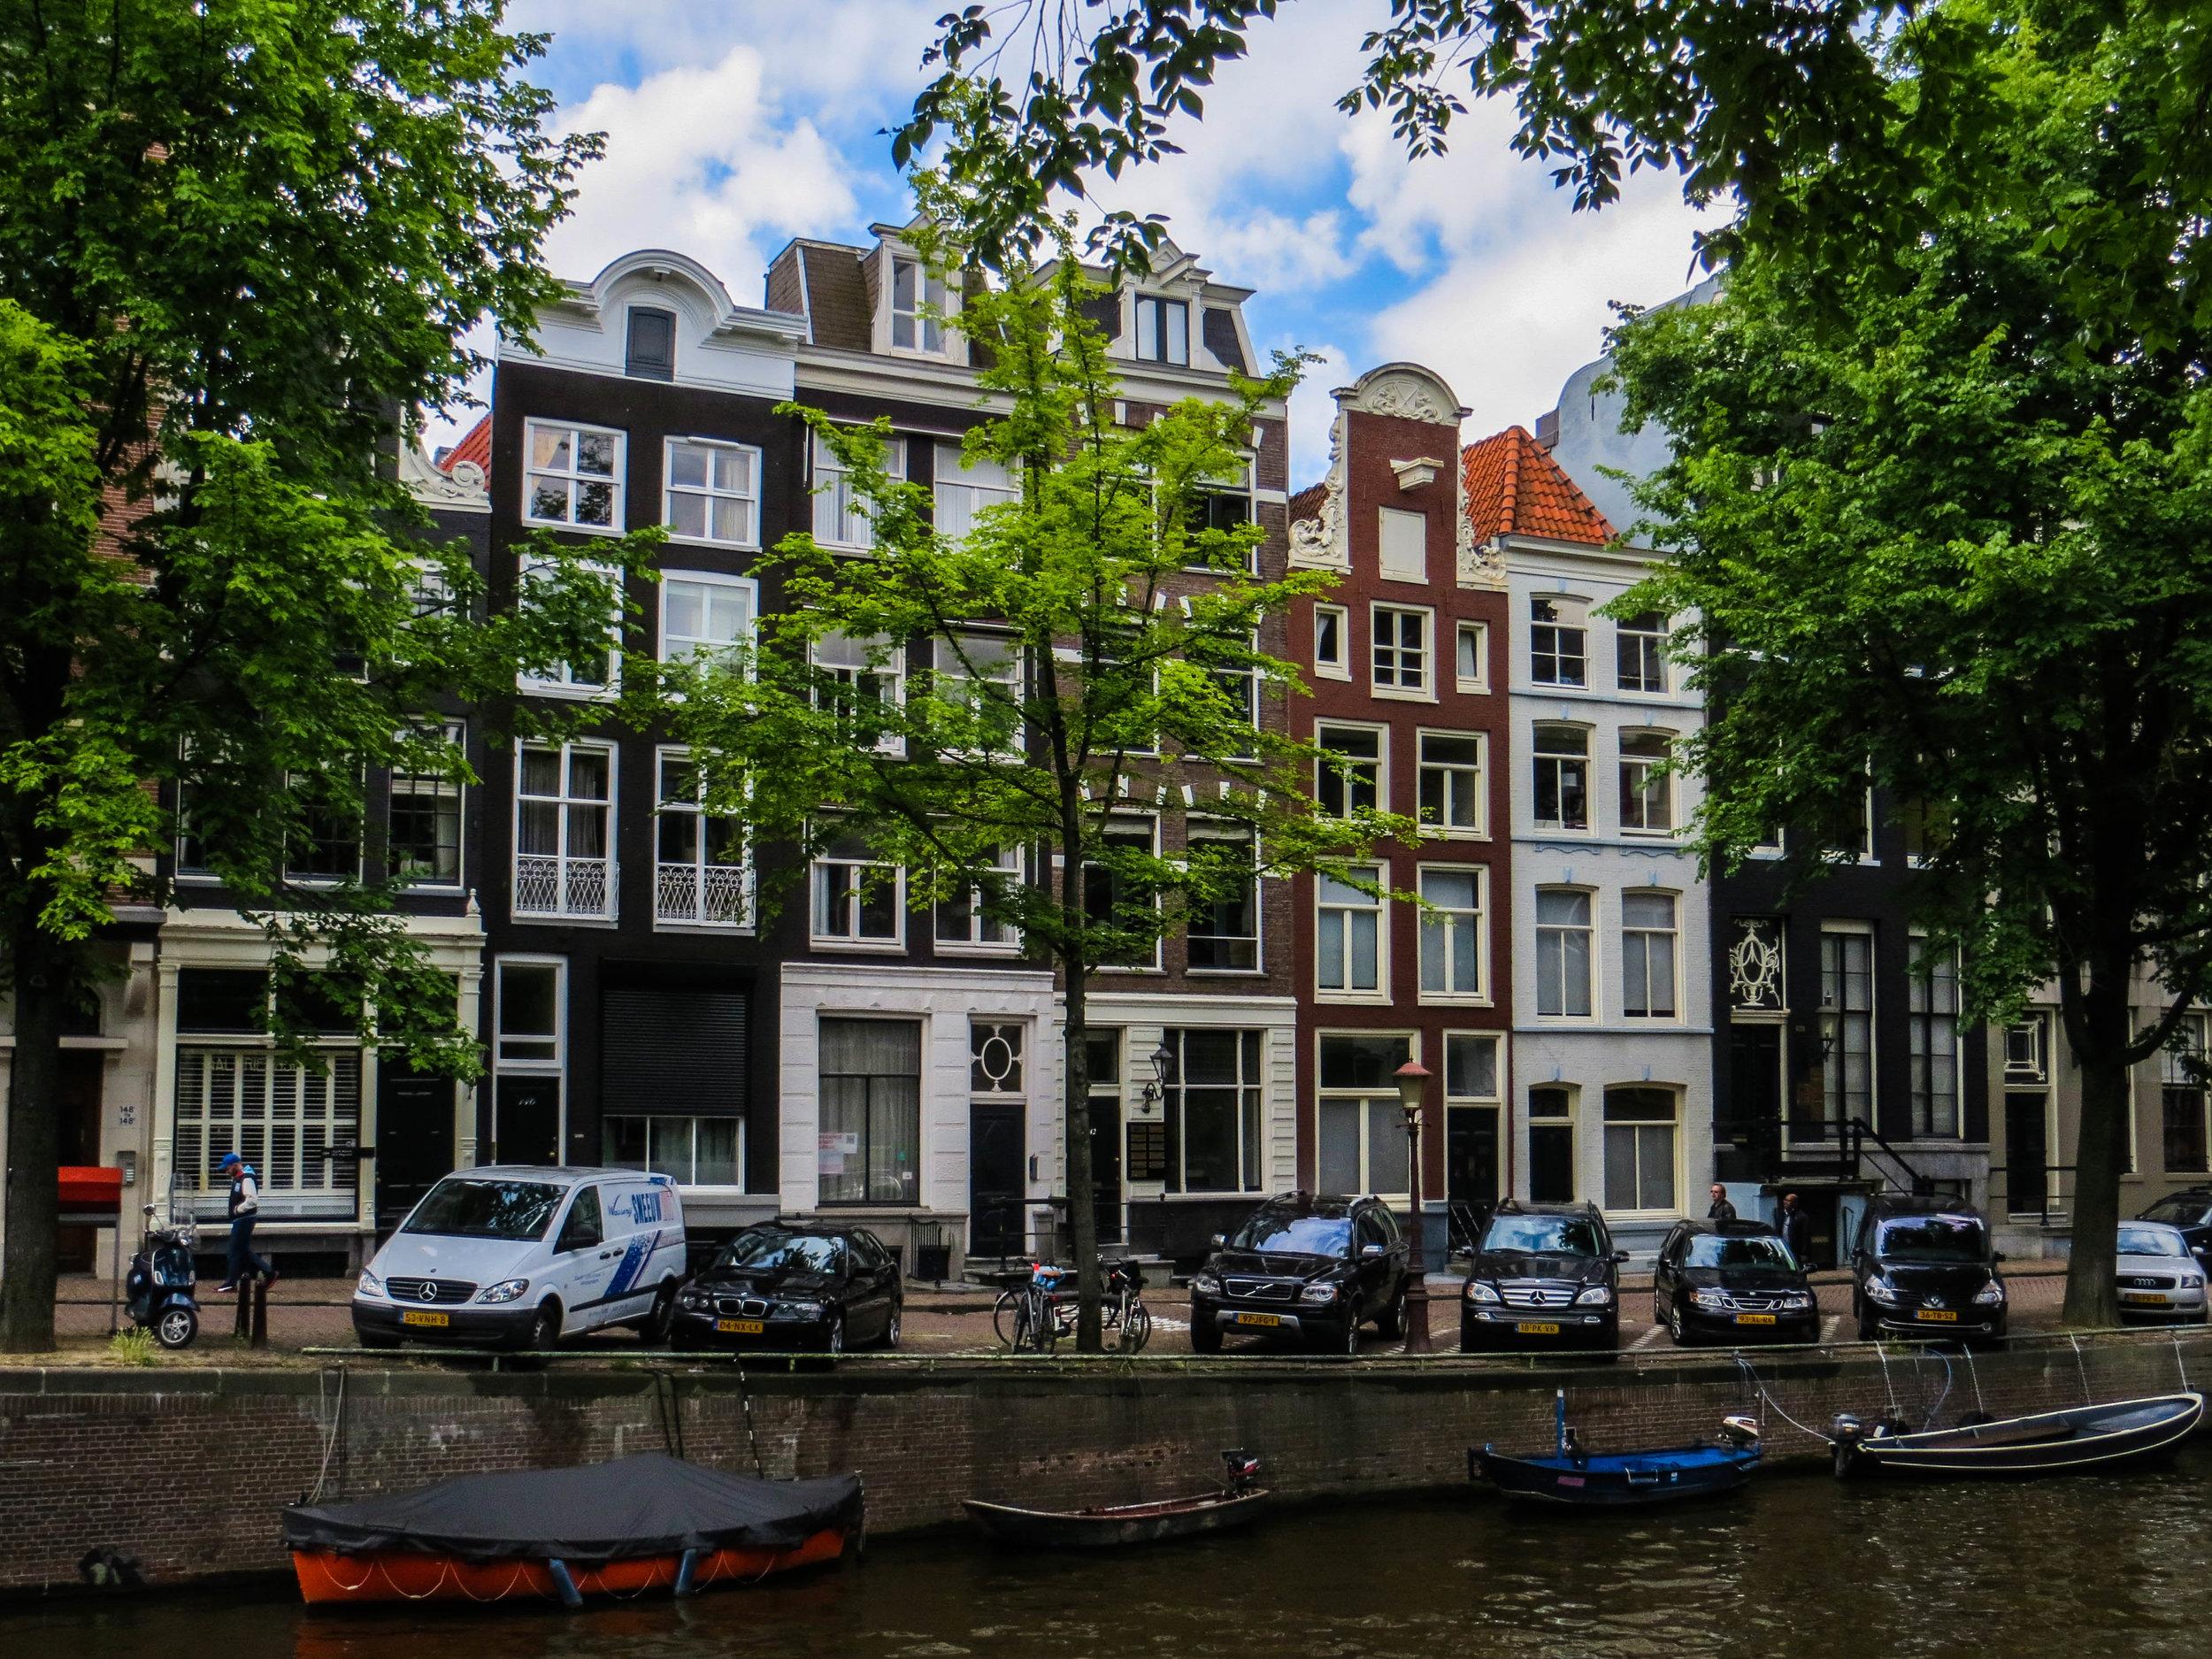 amsterdam-netherlands-street-photography-15-2.jpg